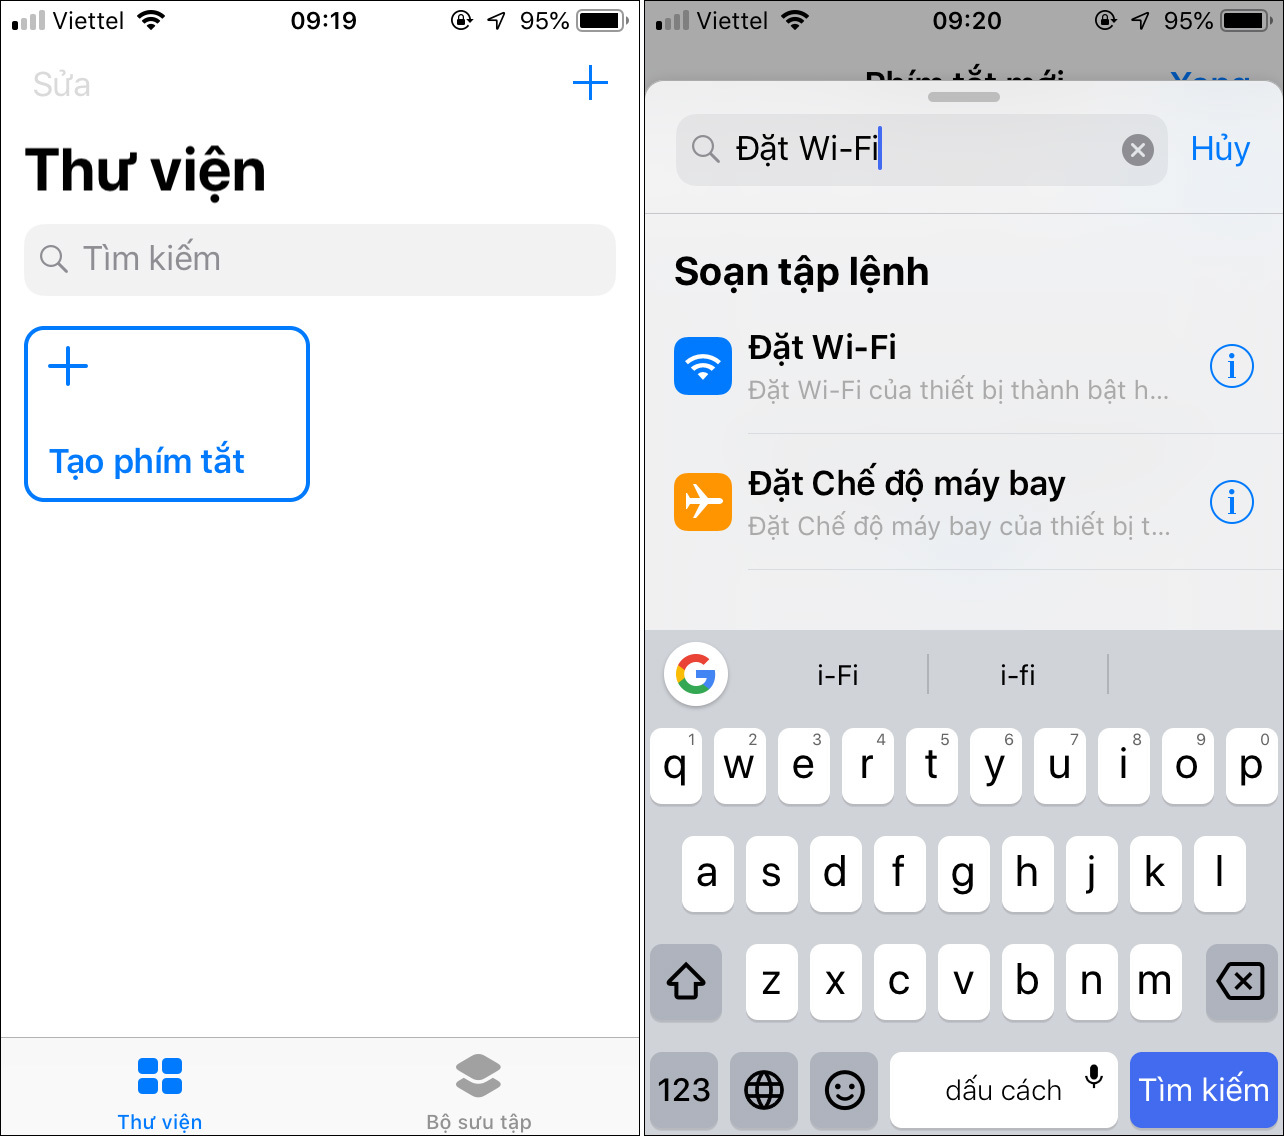 Meo Nho Tat Wi Fi Va Bluetooth Tren Ios 12 Chi Voi Mot Thao Tac 02